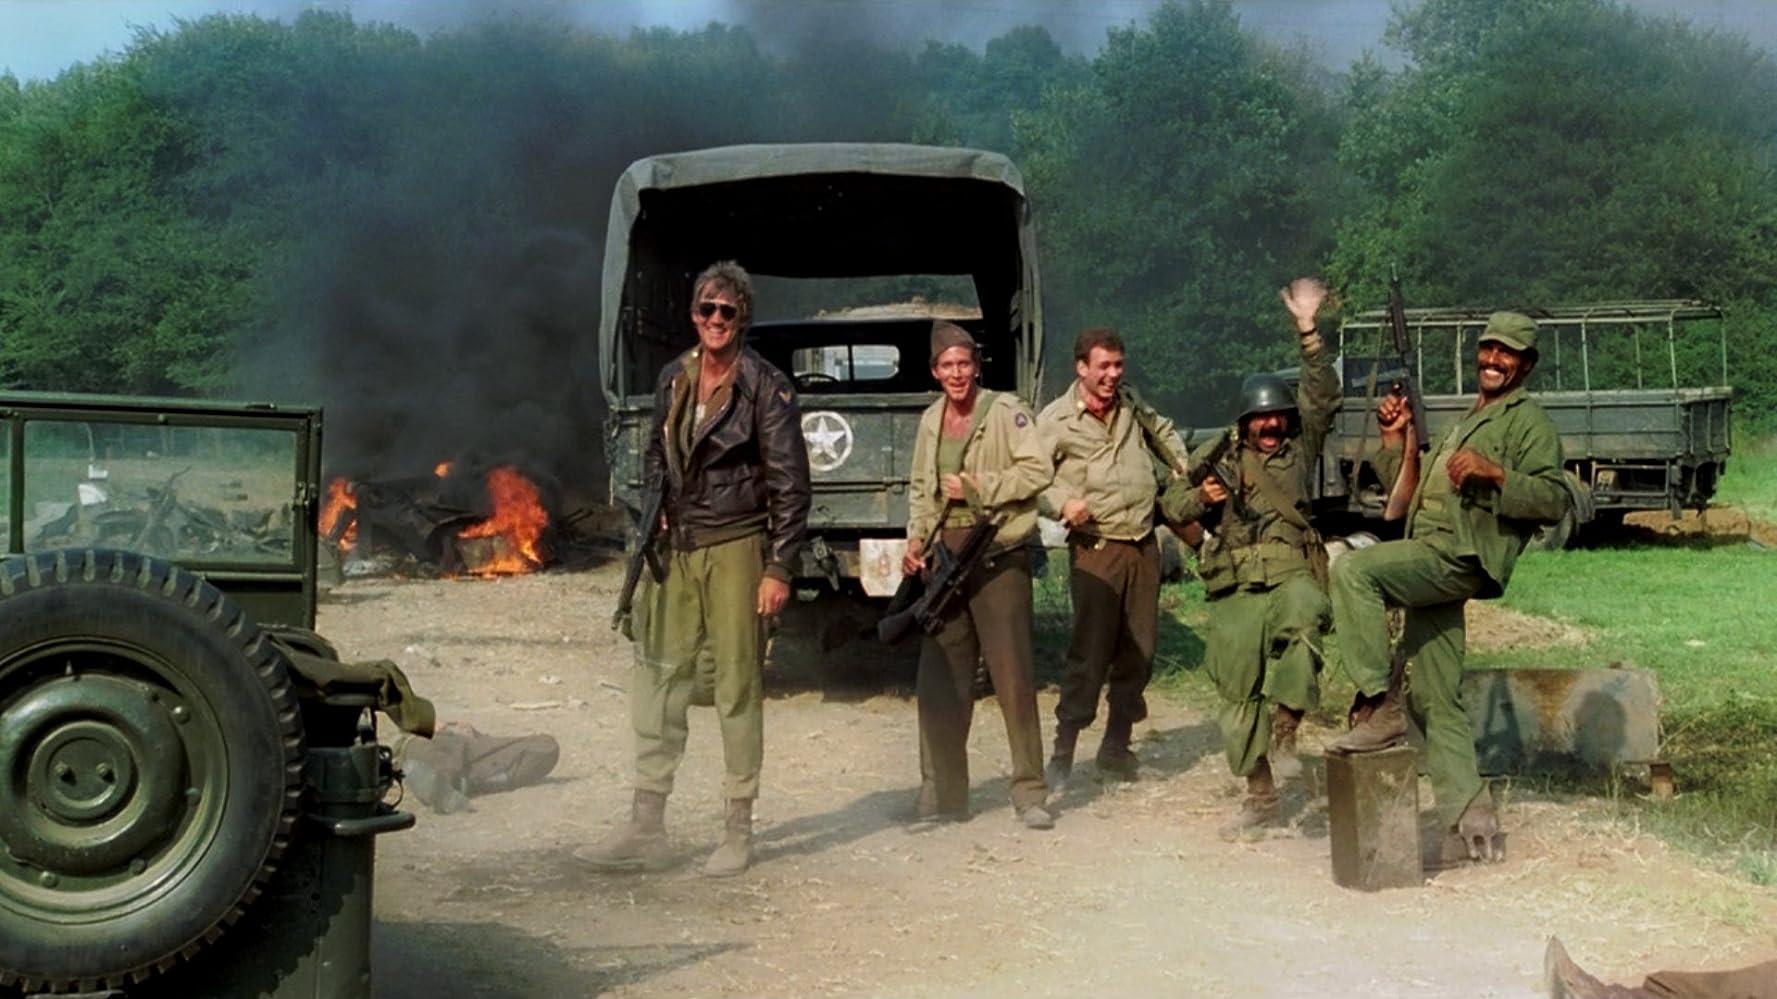 Bo Svenson, Fred Williamson, Jackie Basehart, Peter Hooten, and Michael Pergolani in Quel maledetto treno blindato (1978)